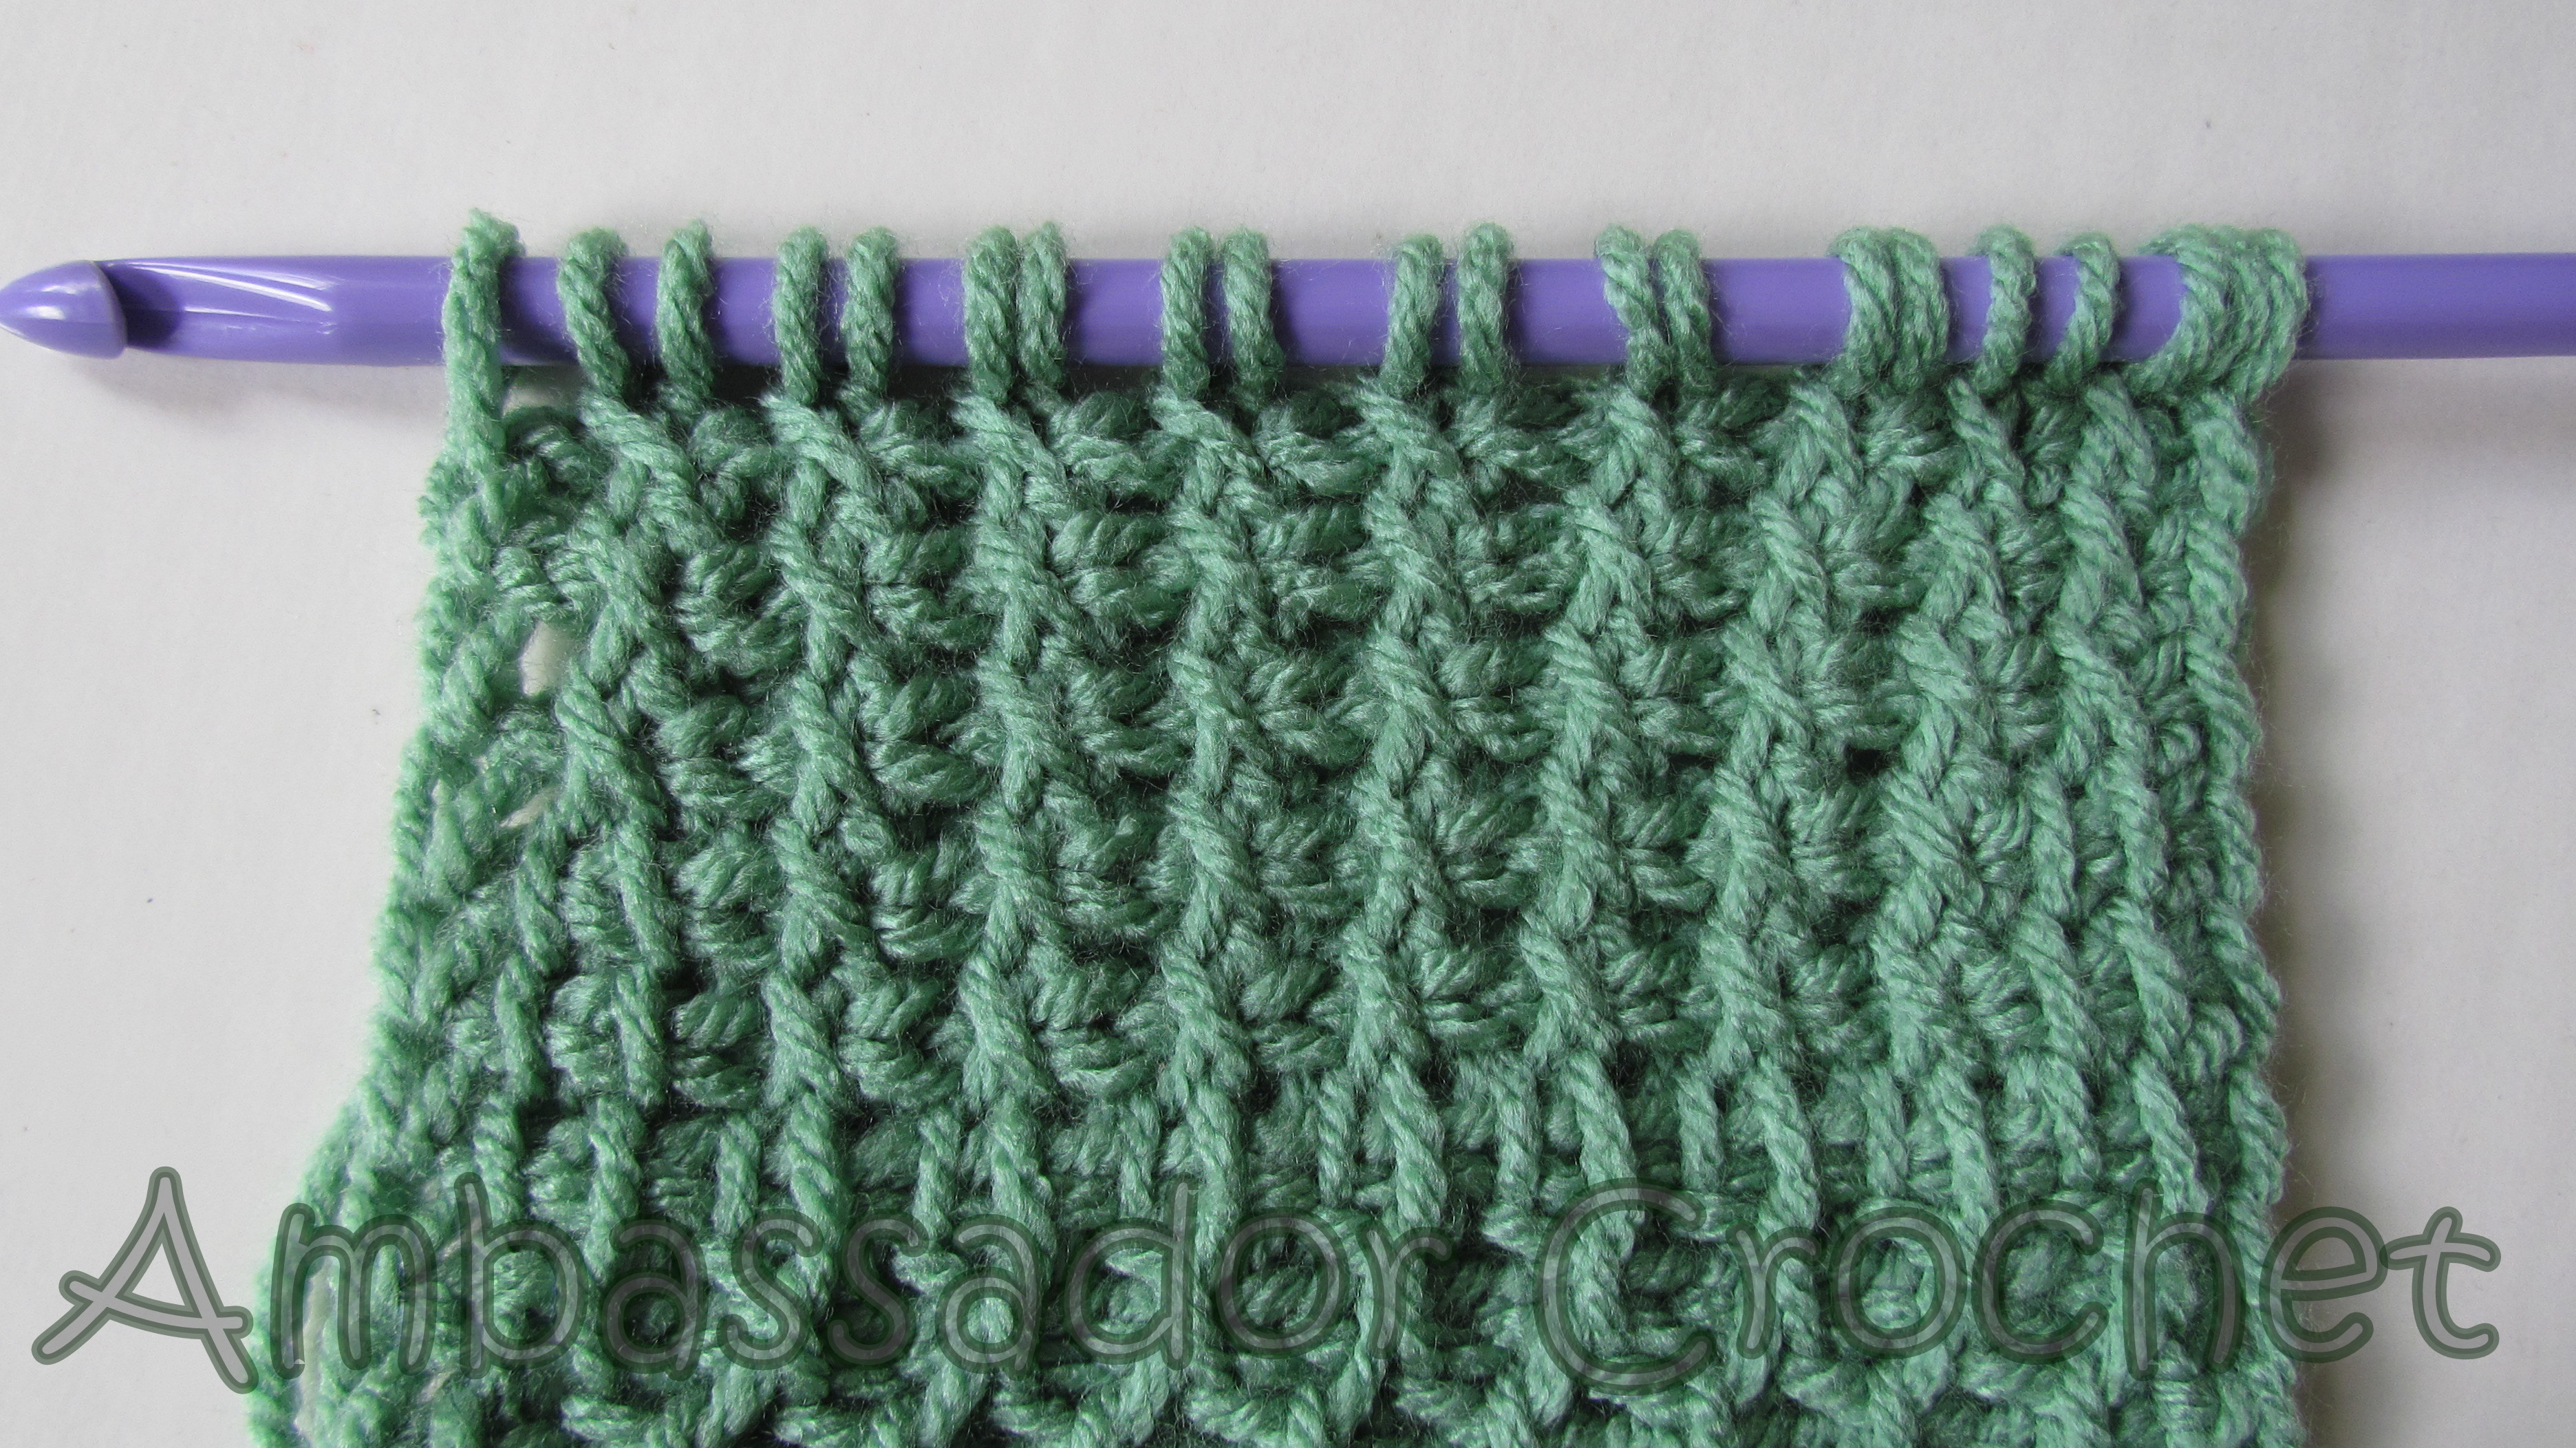 ... CrochetTunisian Sampler Scarf Archives - Ambassador Crochet